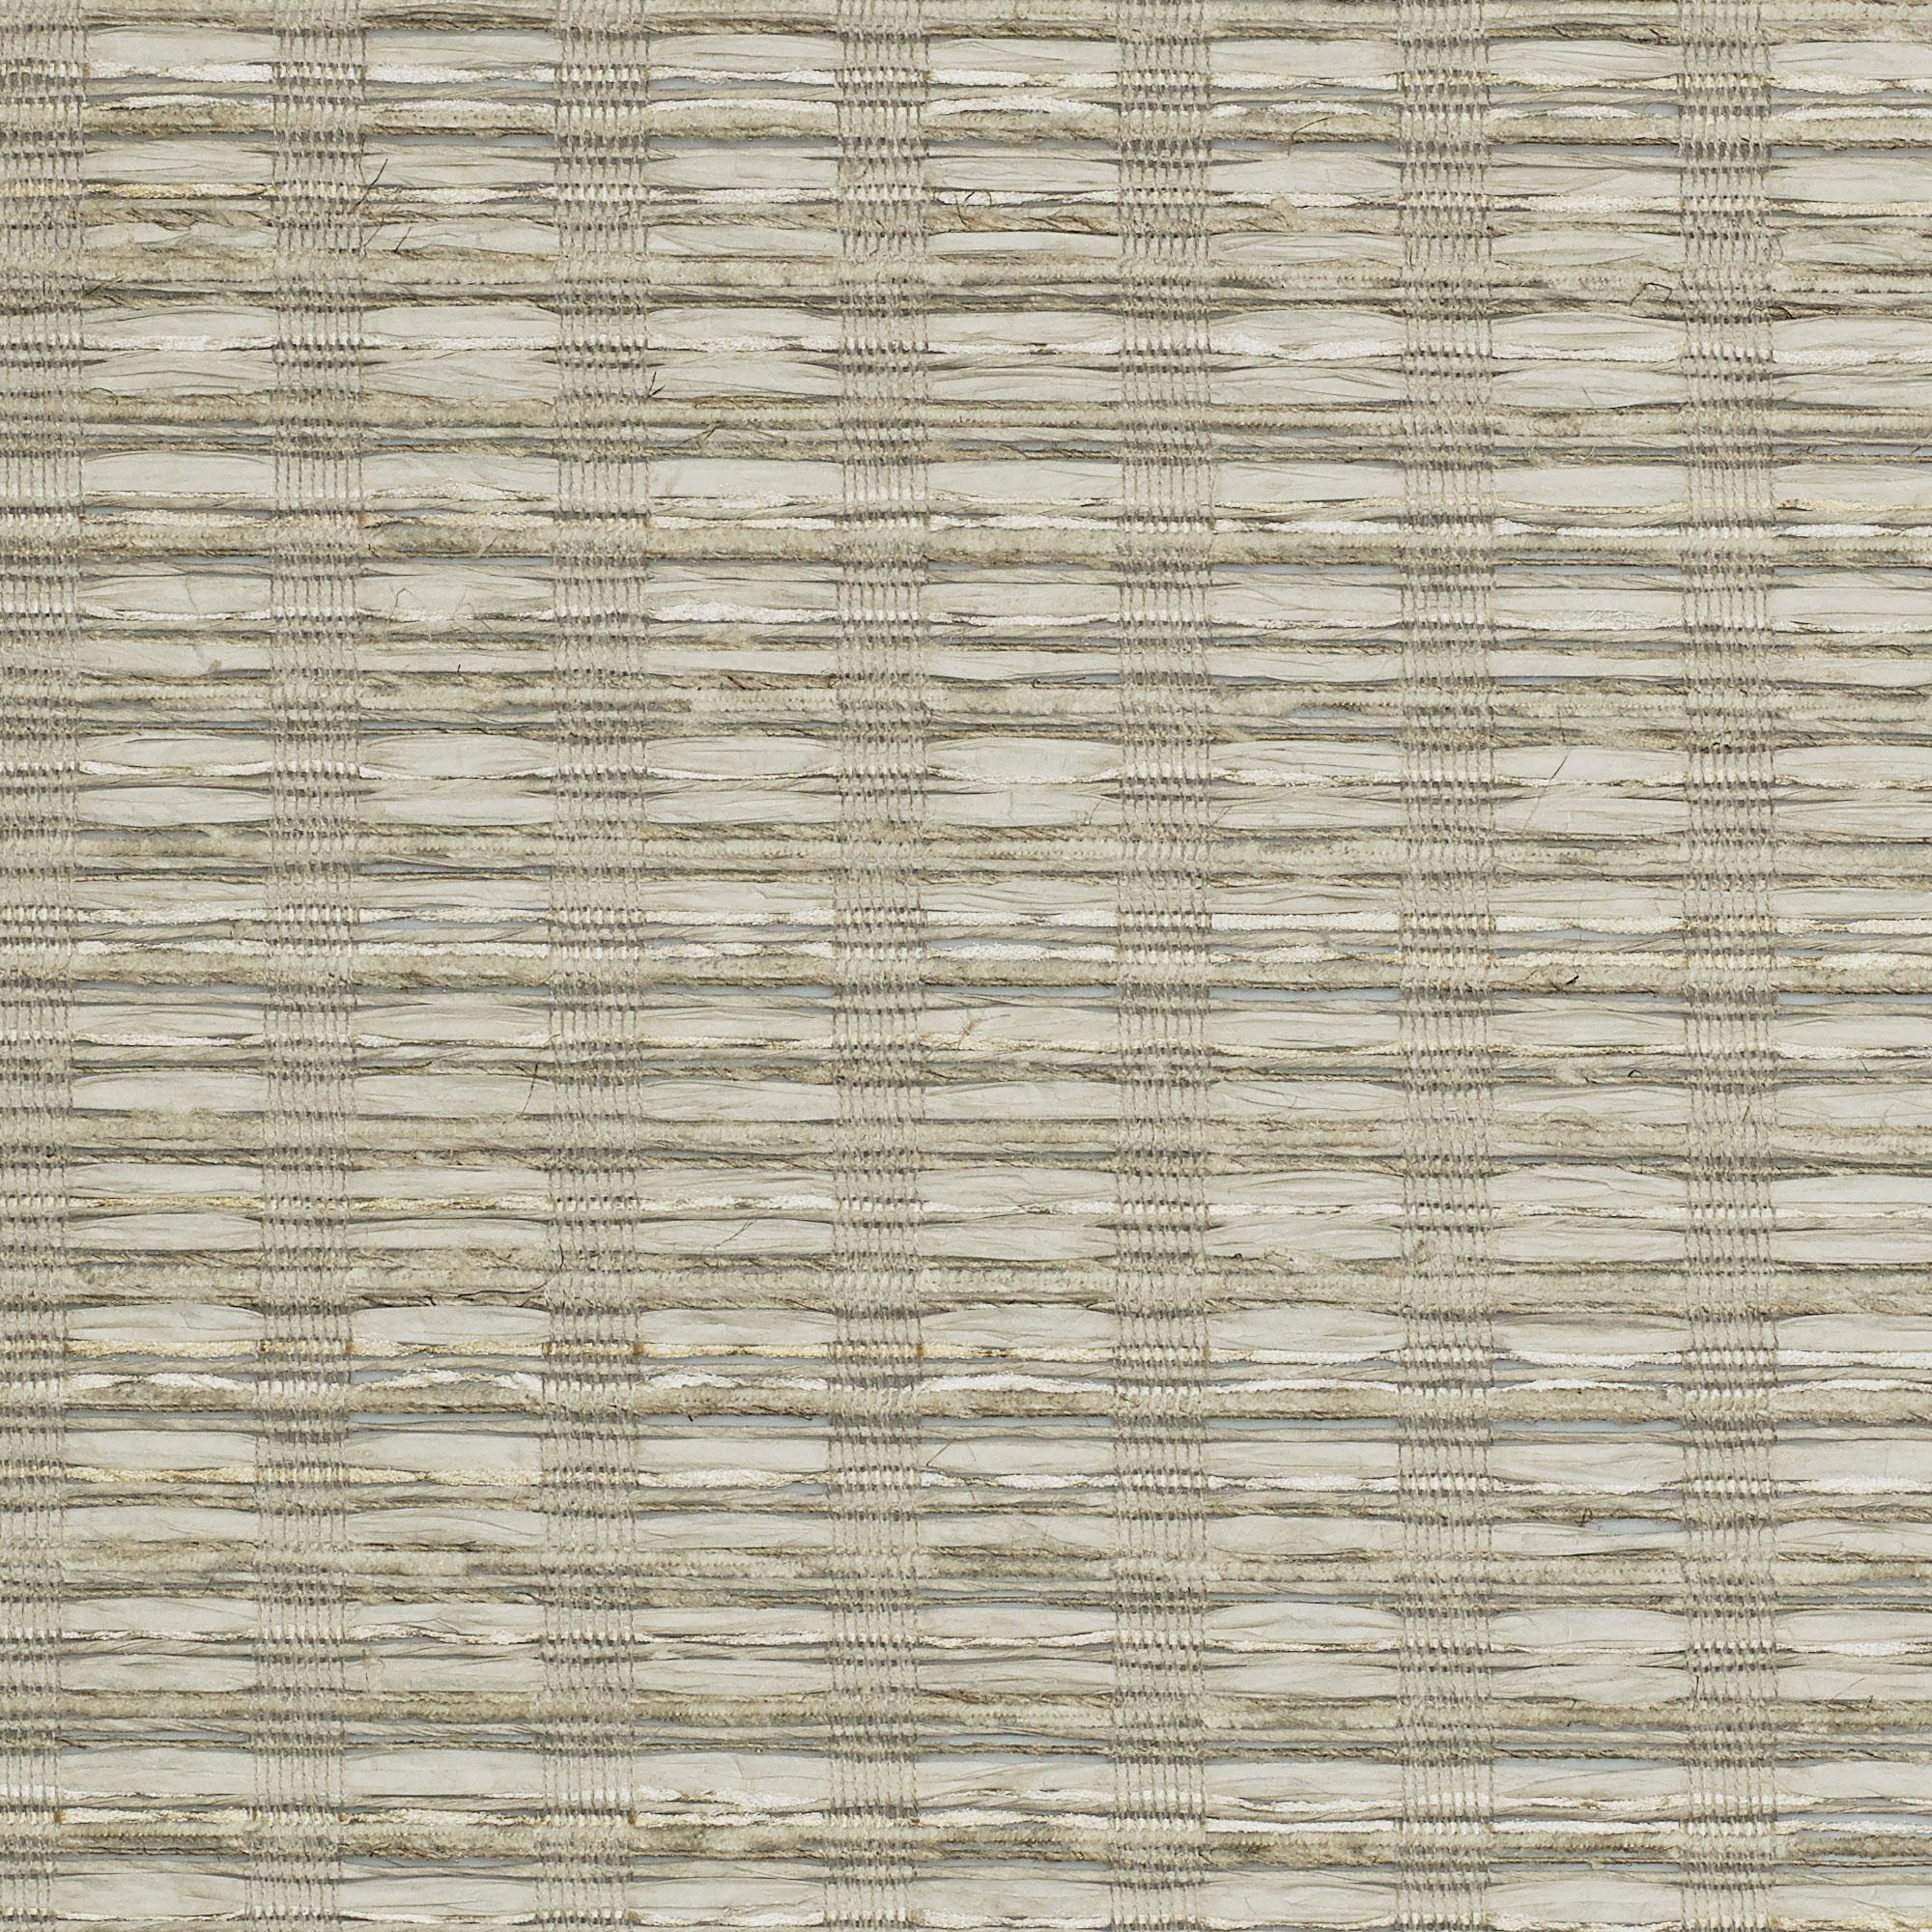 swatch-PW157-36-woolen-mill-heathered-web.jpg